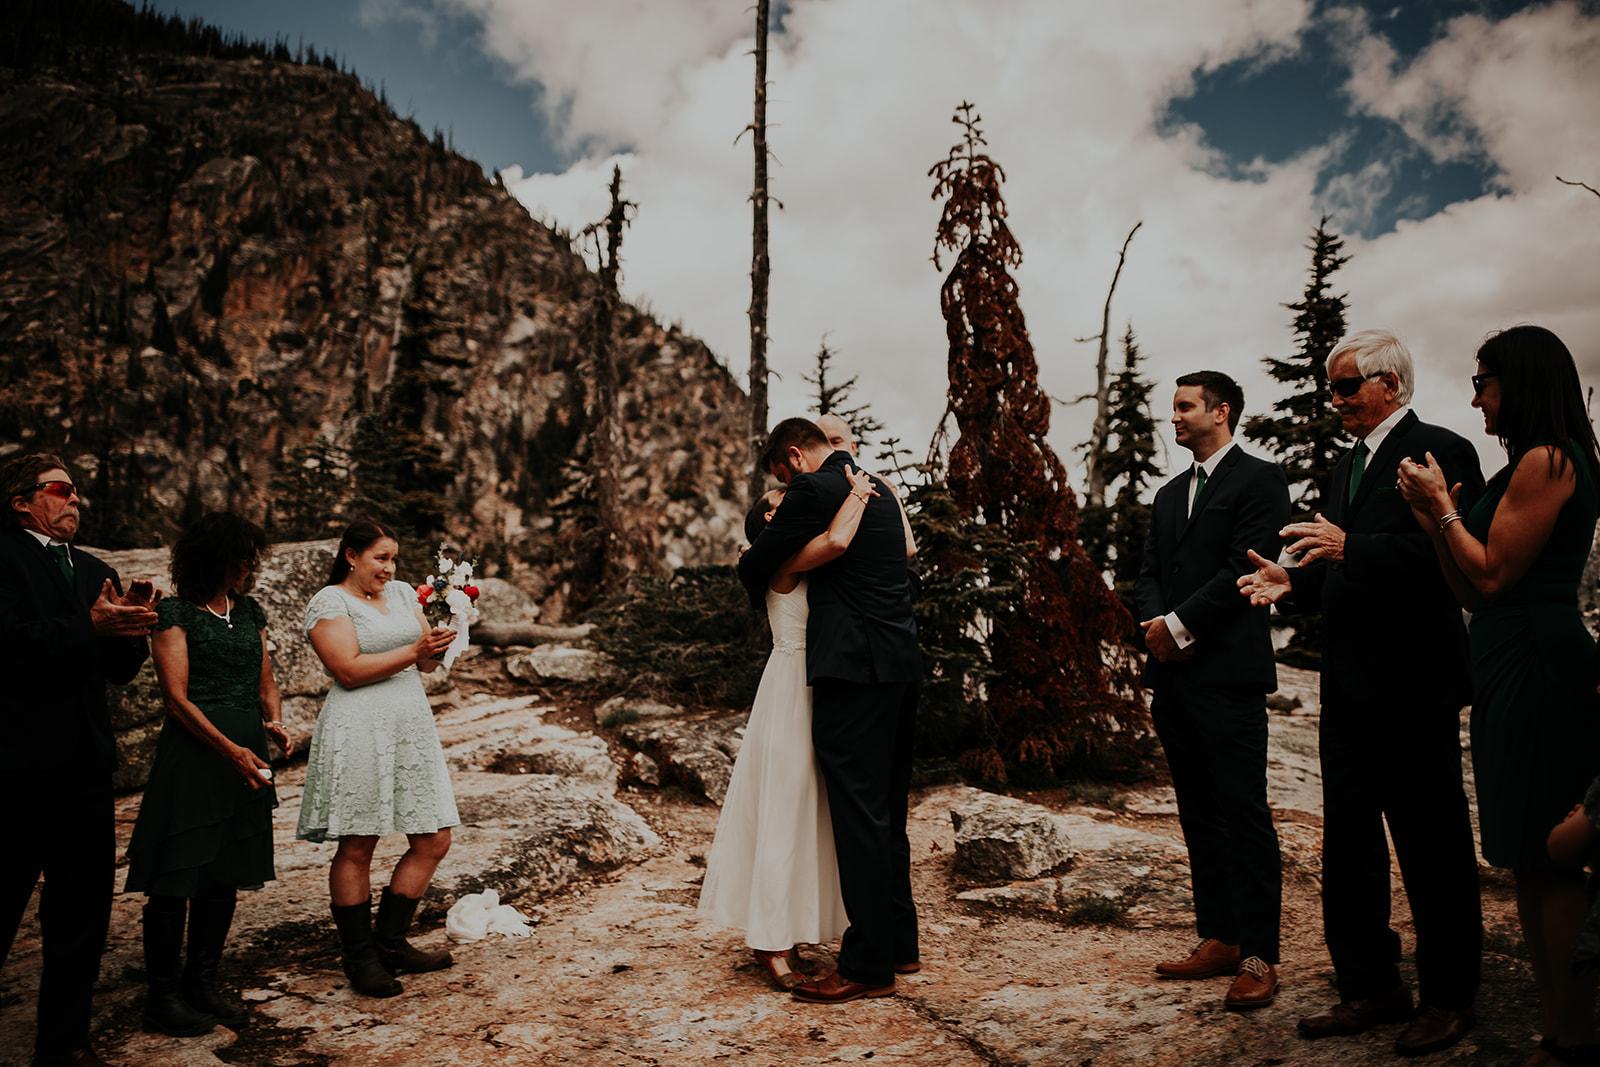 winthrop-wedding-photographer-megan-gallagher-photography (17).jpg